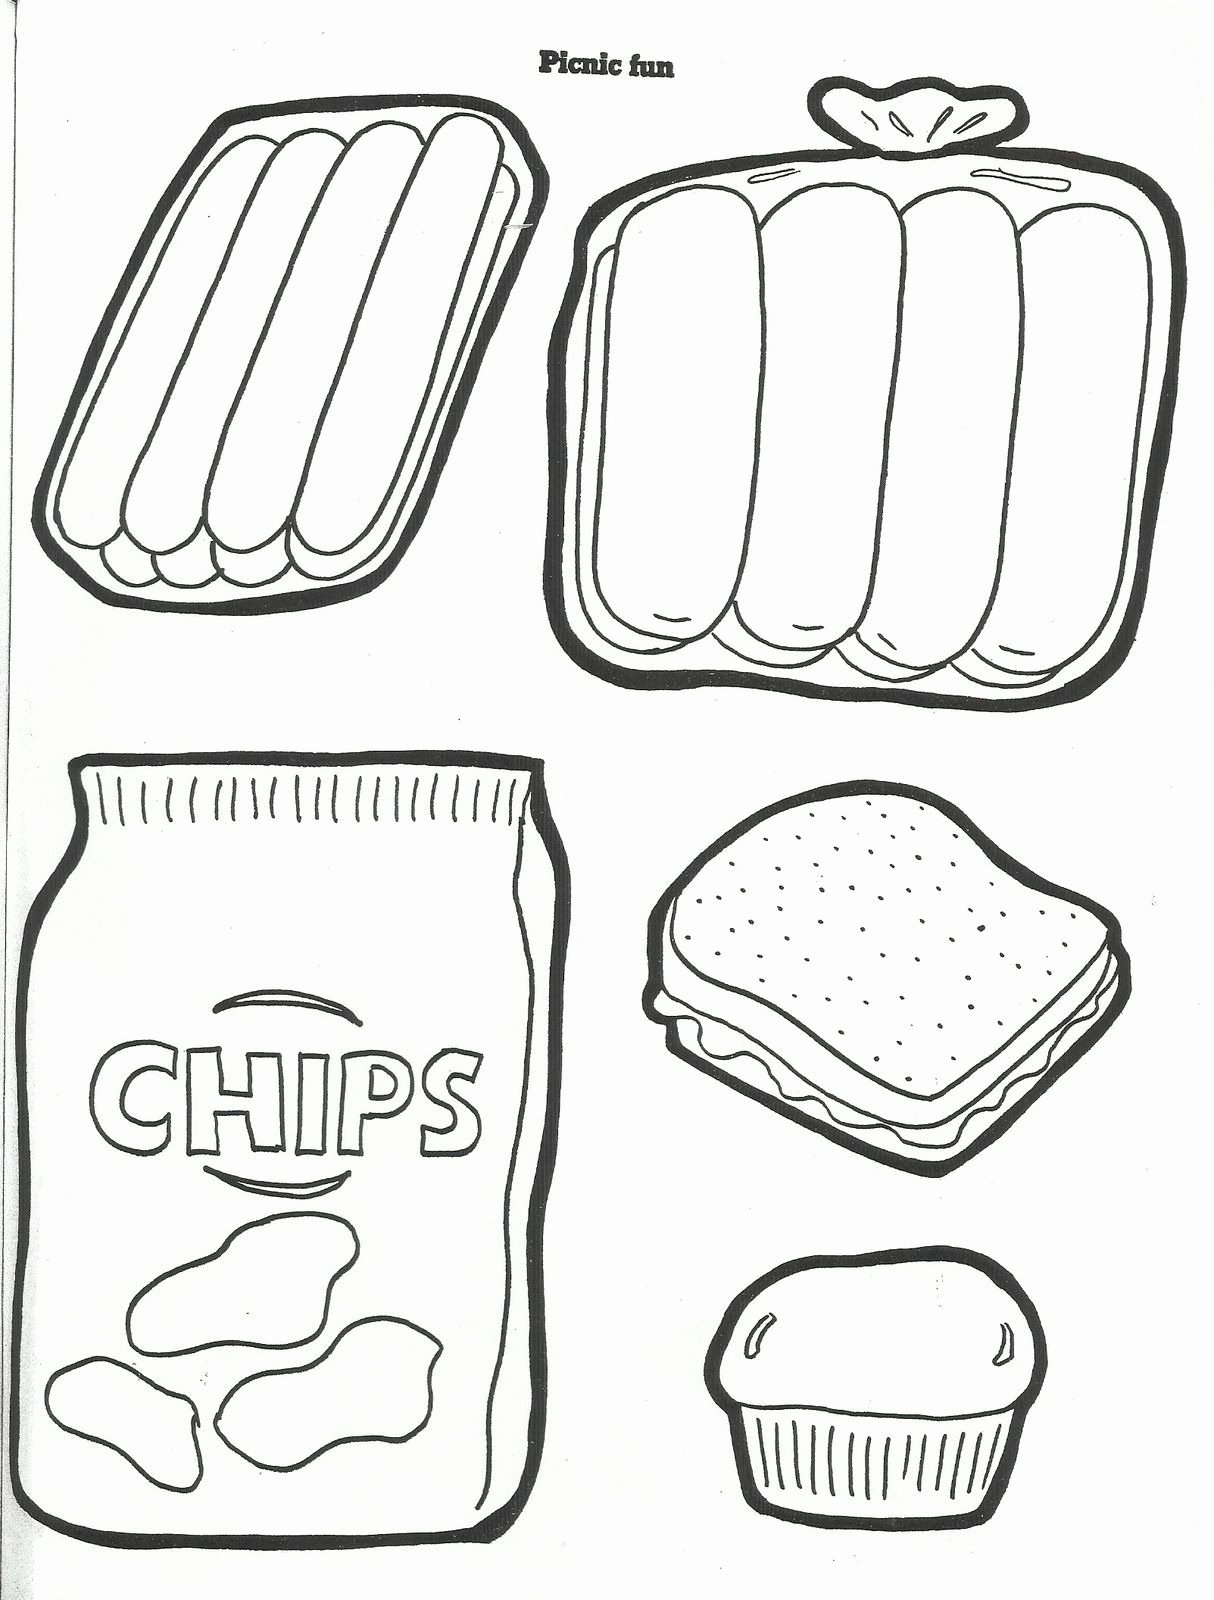 Good Habits Worksheets for Preschoolers Lovely Squish Preschool Ideas Food Teach Nutrition Good Eating